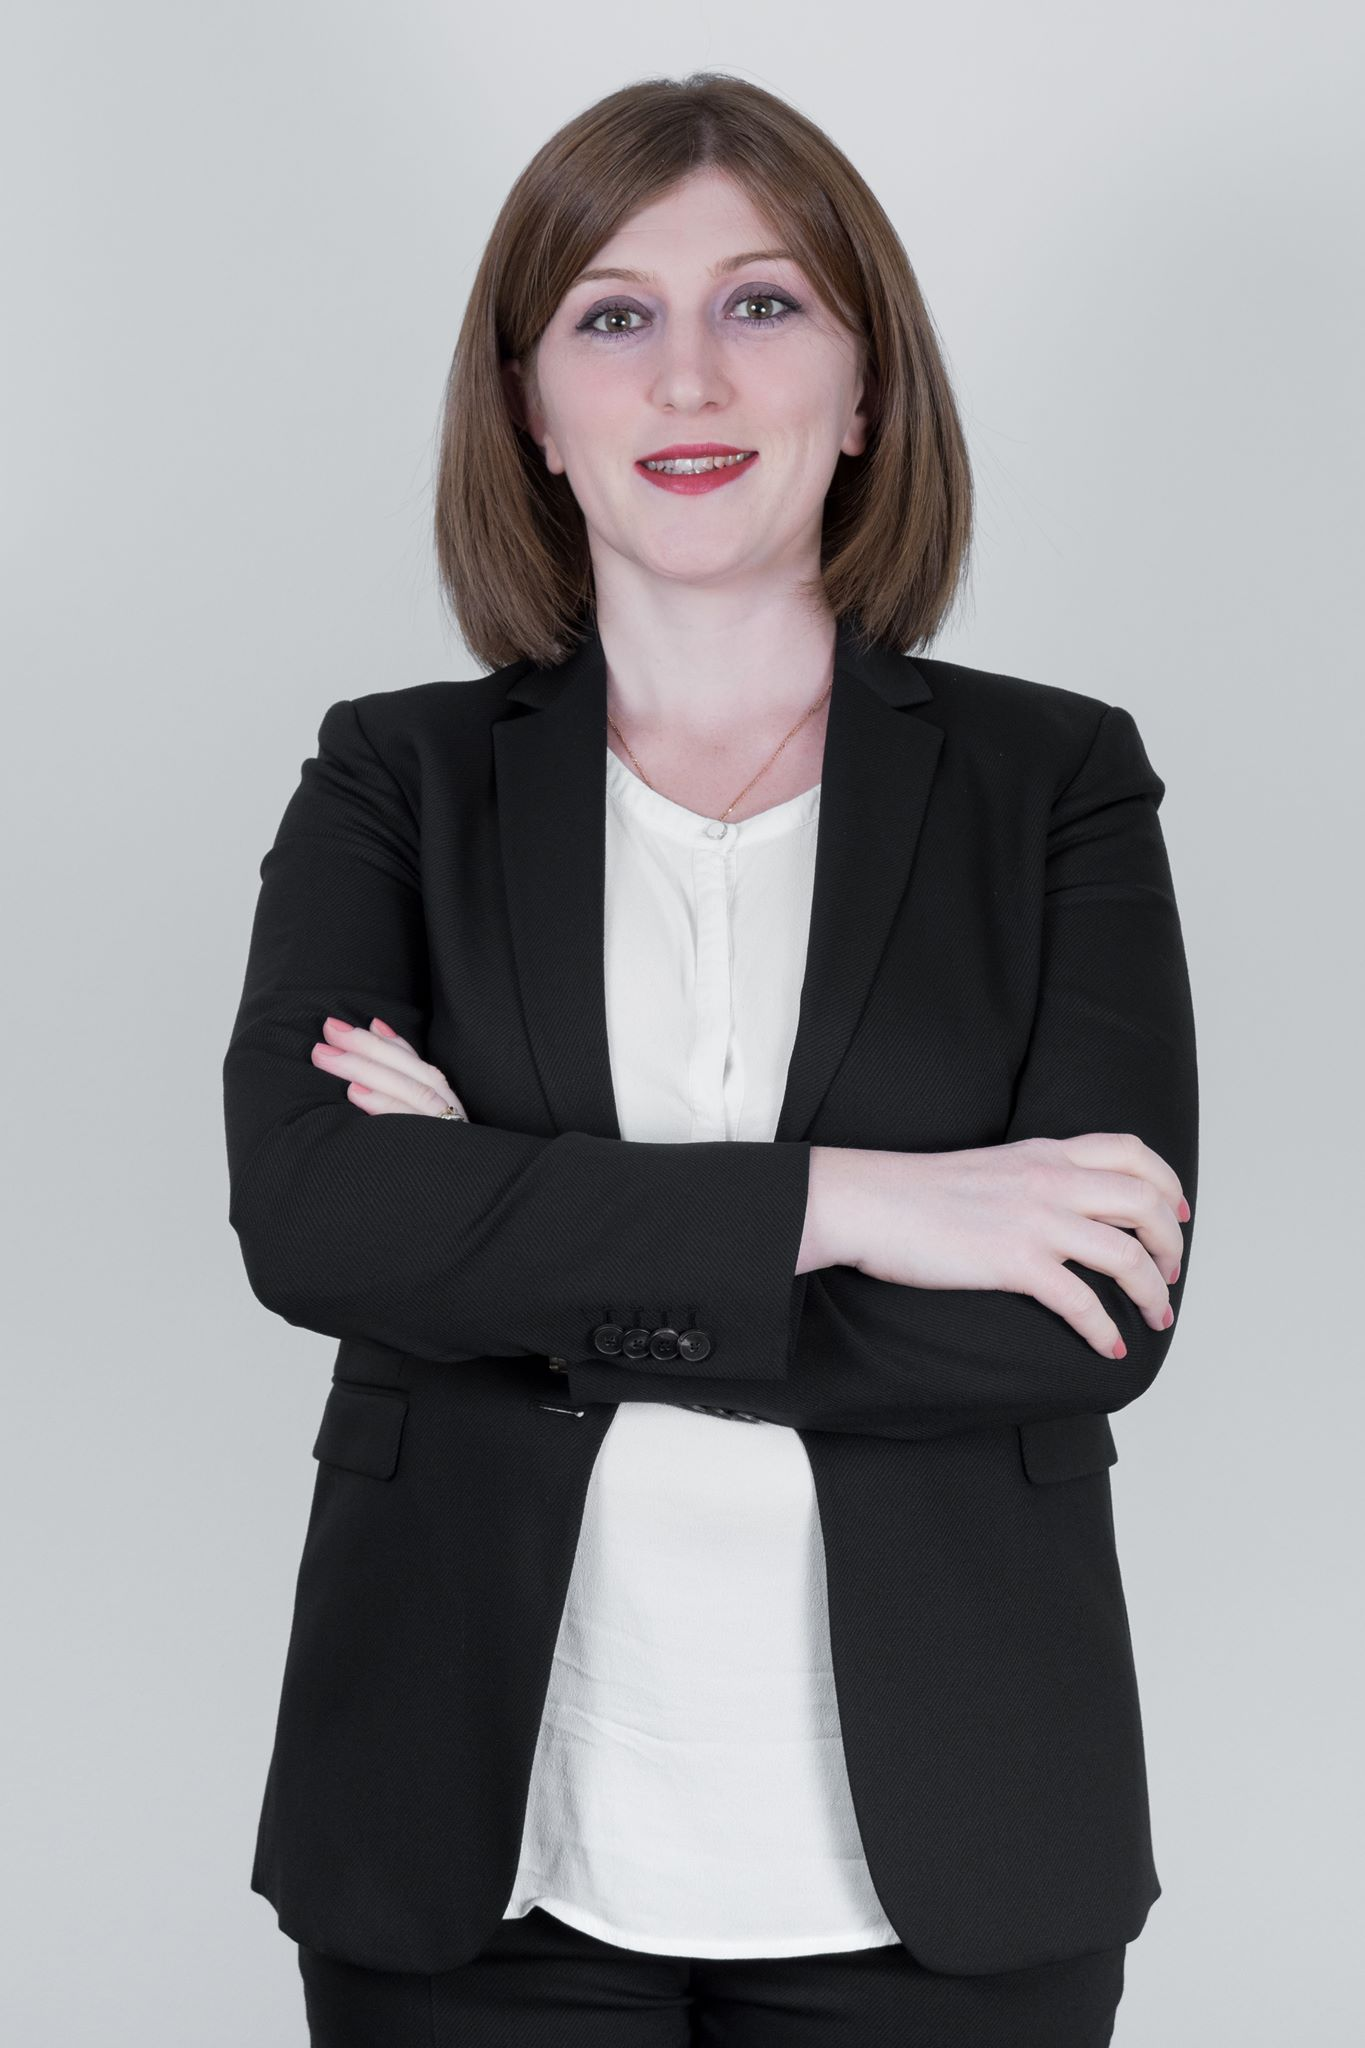 Sophie Ukebla